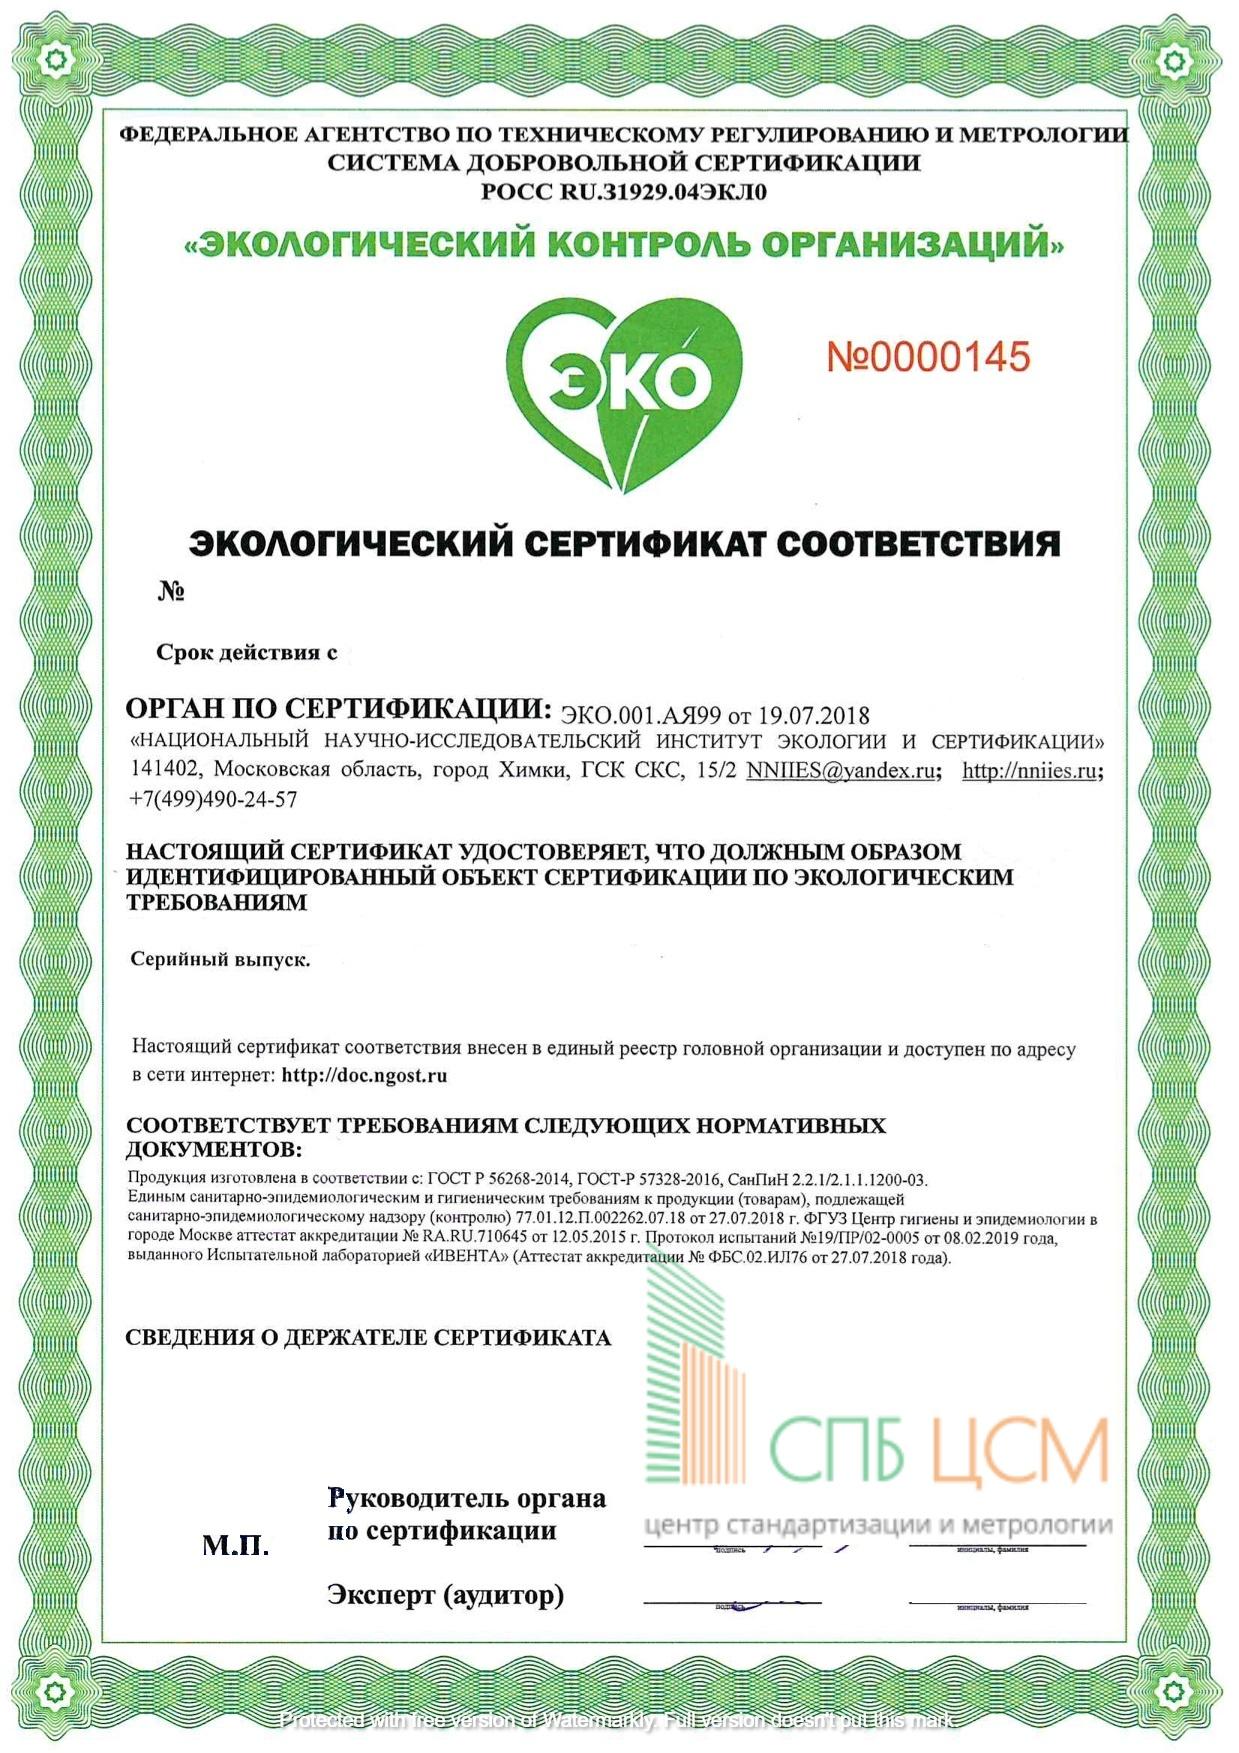 https://spbcsm.ru/prochie-dokumenty/ekologichesky-sertificat/#content